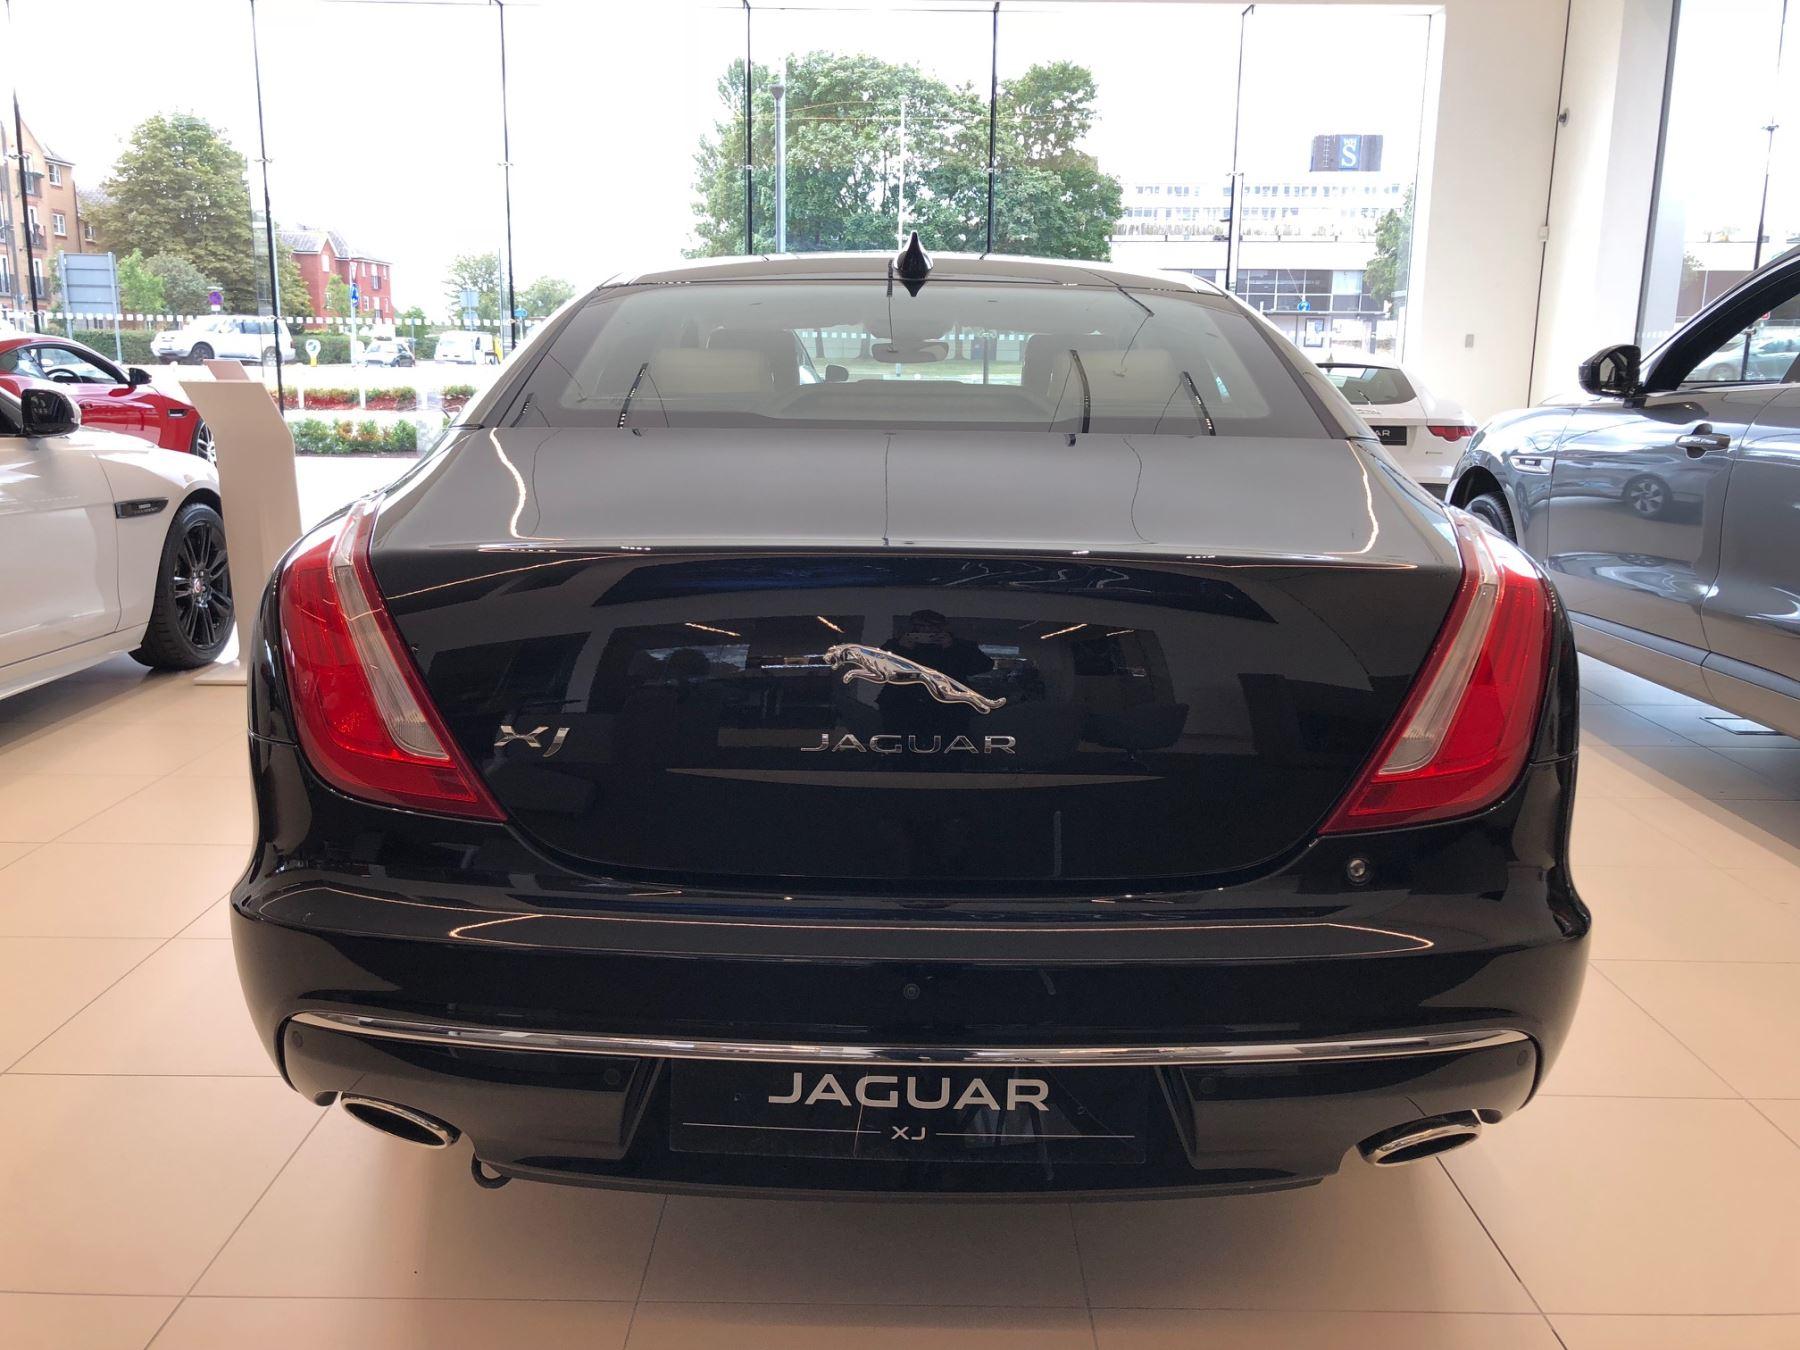 Jaguar XJ 3.0d V6 Portfolio image 4